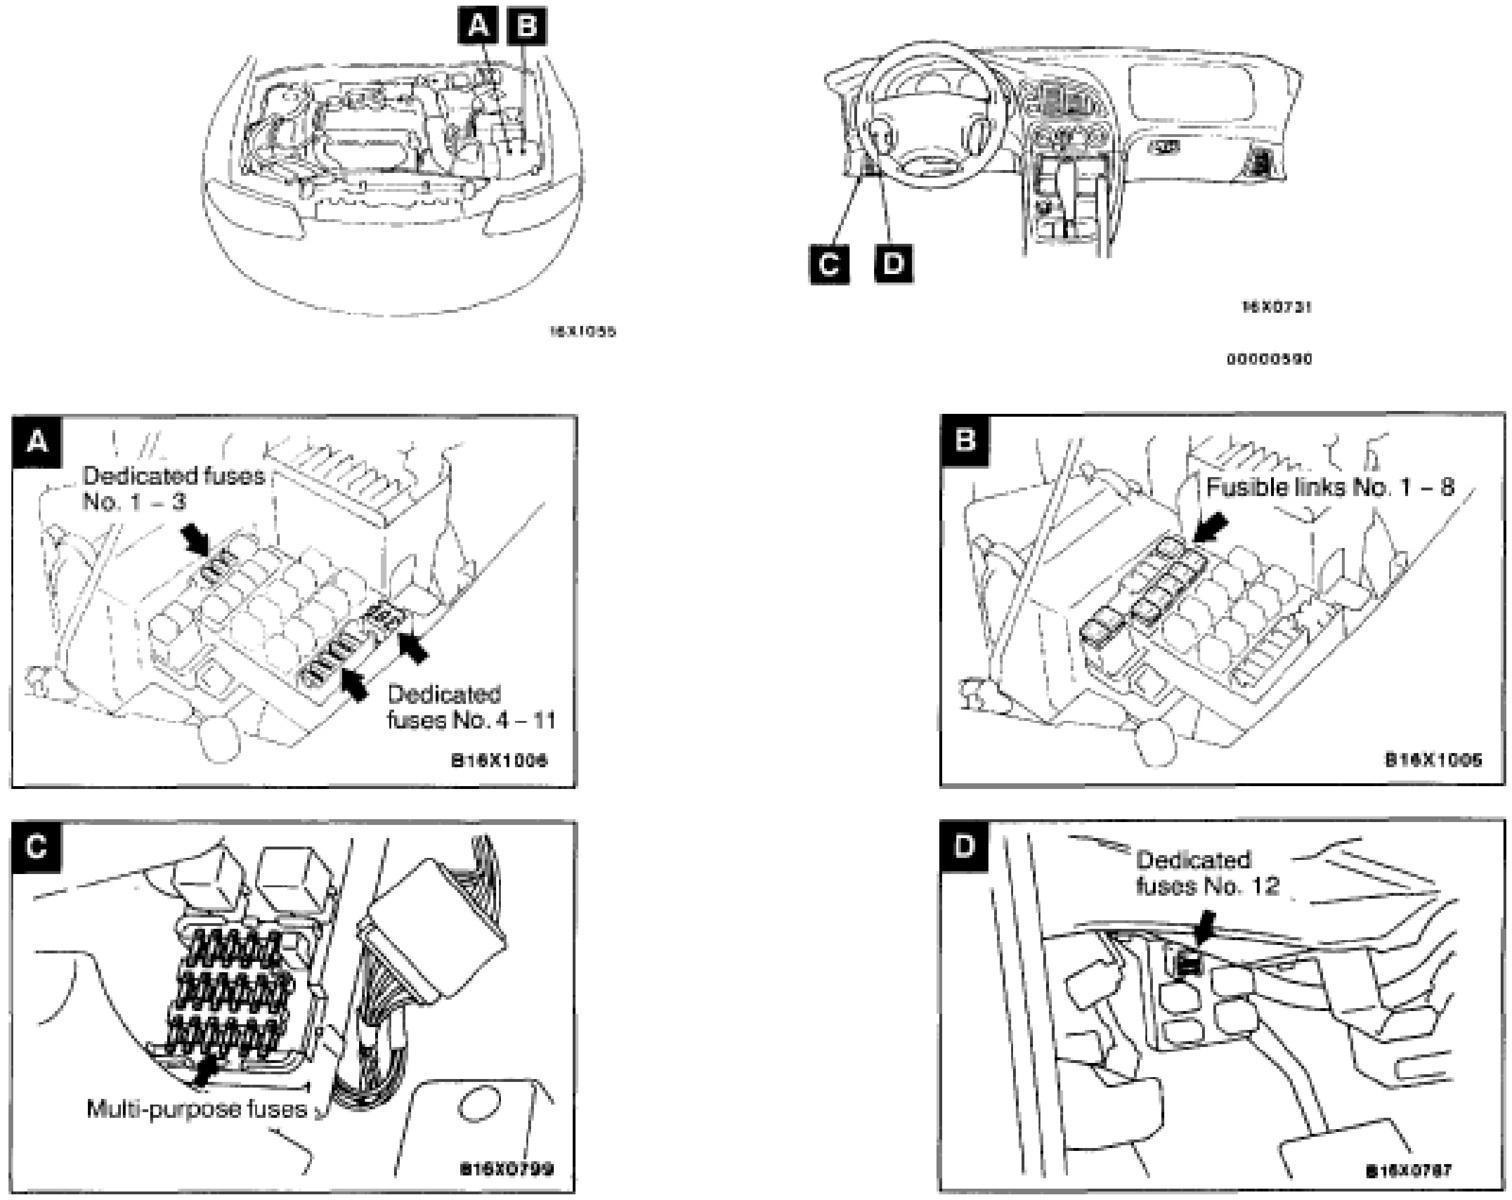 ... Western Unimount Plow Relay Wiring Diagram moreover Boss V Plow Wiring Schematic also Cen Tech Wiring ...